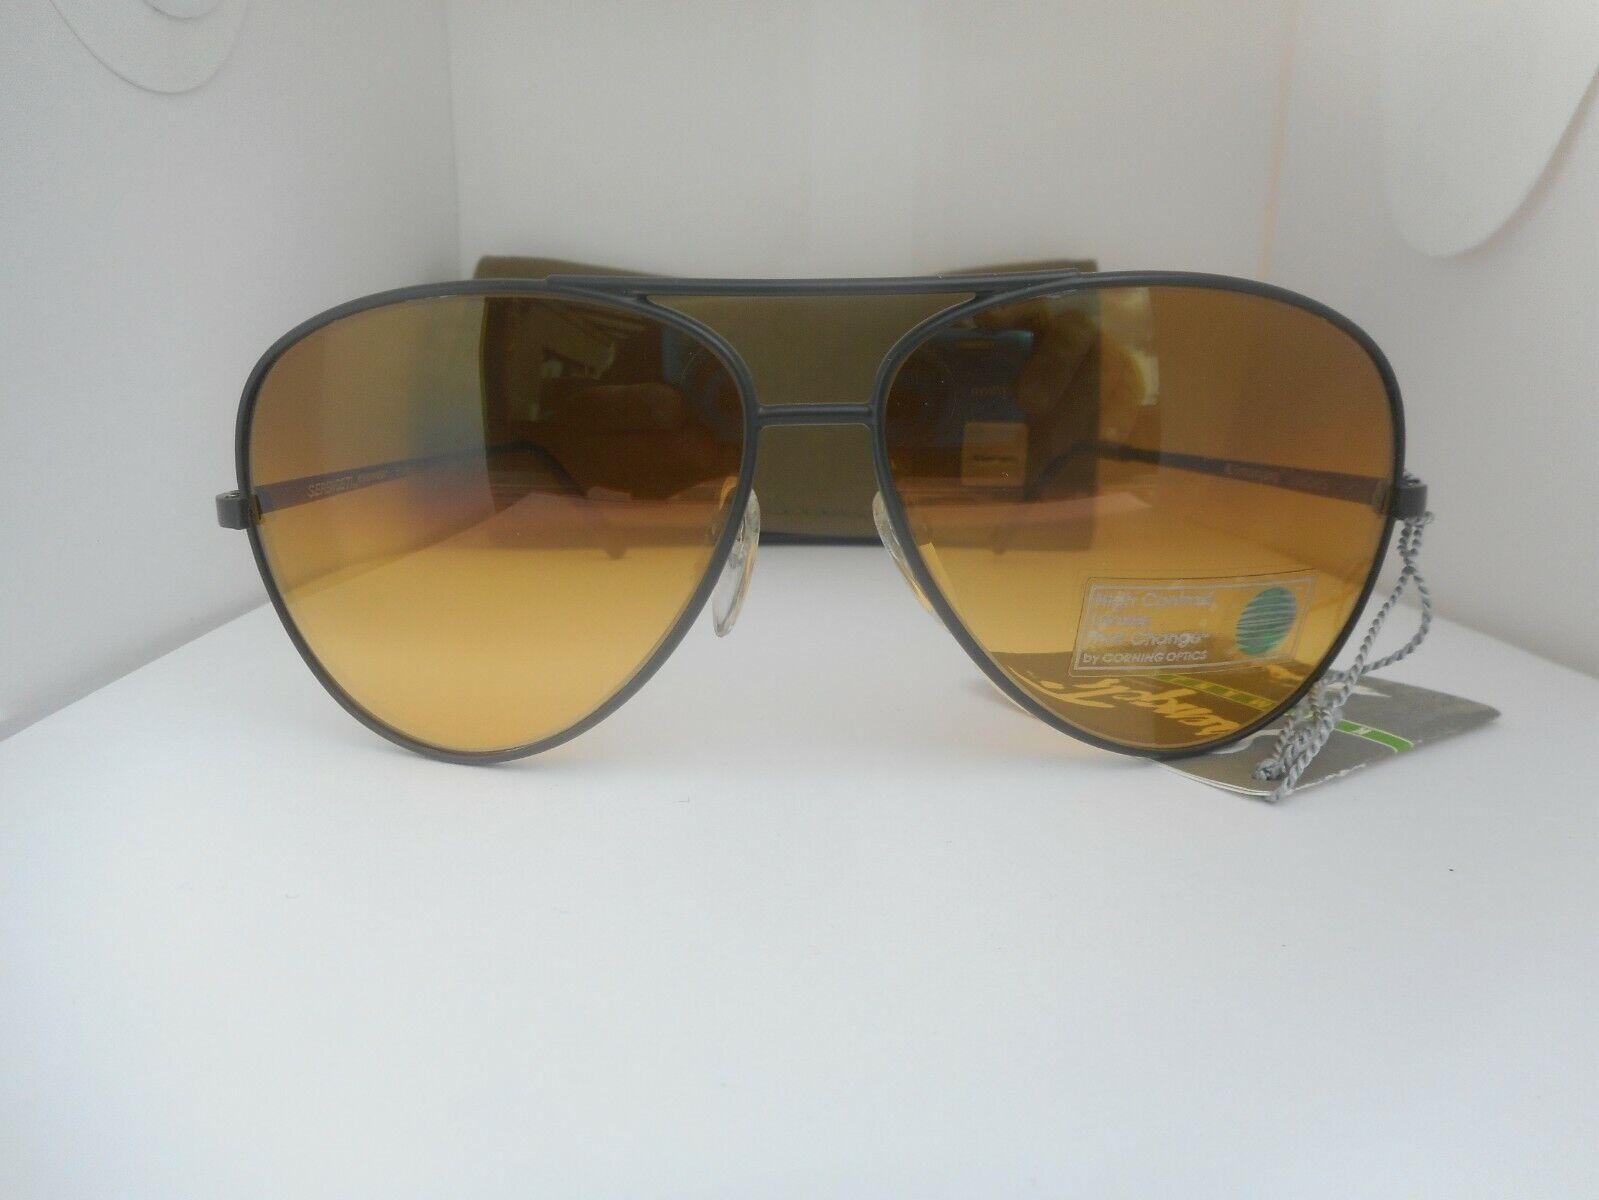 vintage sunglasses serengeti 5128S kilimanjaro higt contras lenses that change